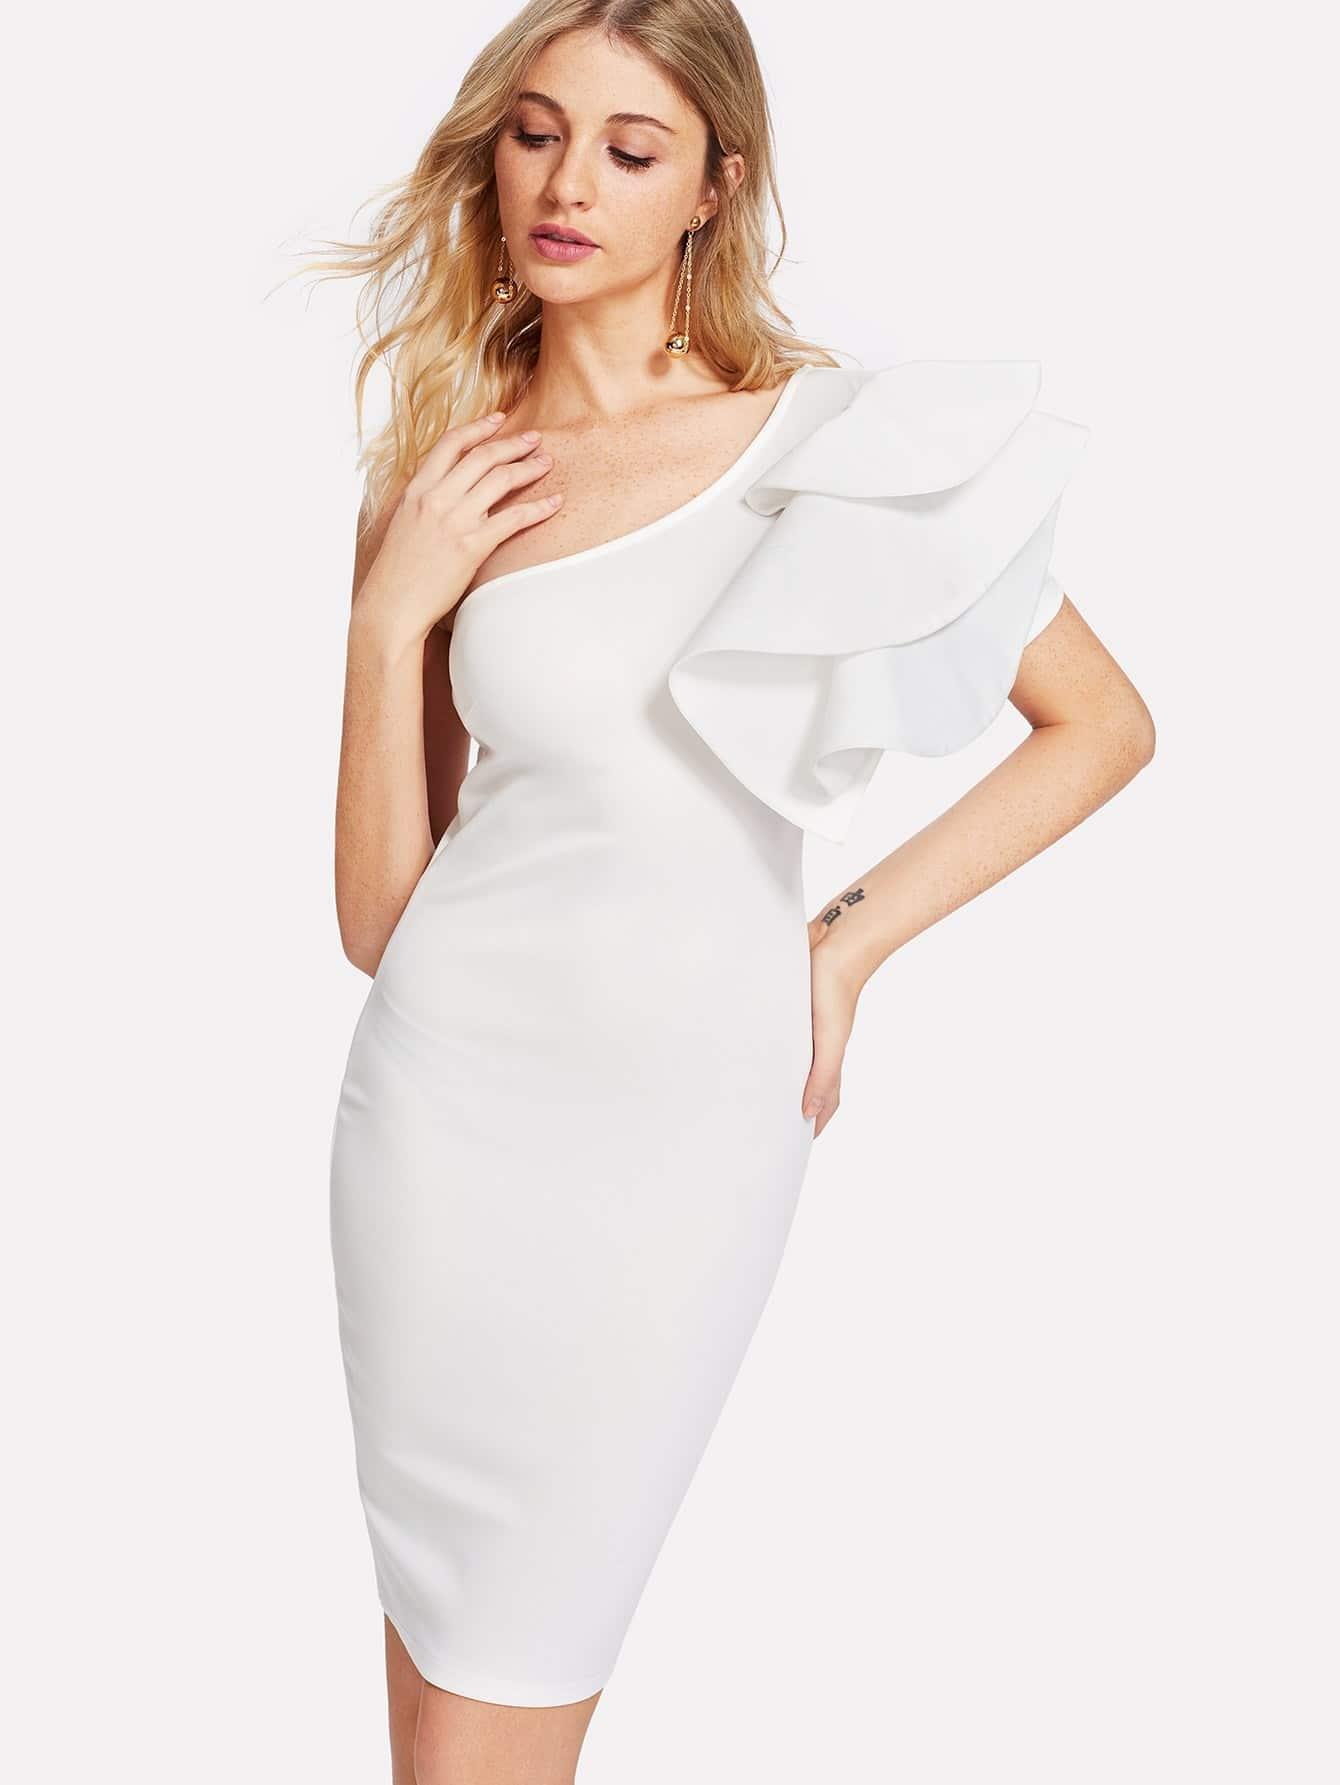 Exaggerate Ruffle One Shoulder Dress one shoulder ruffle embellished dress